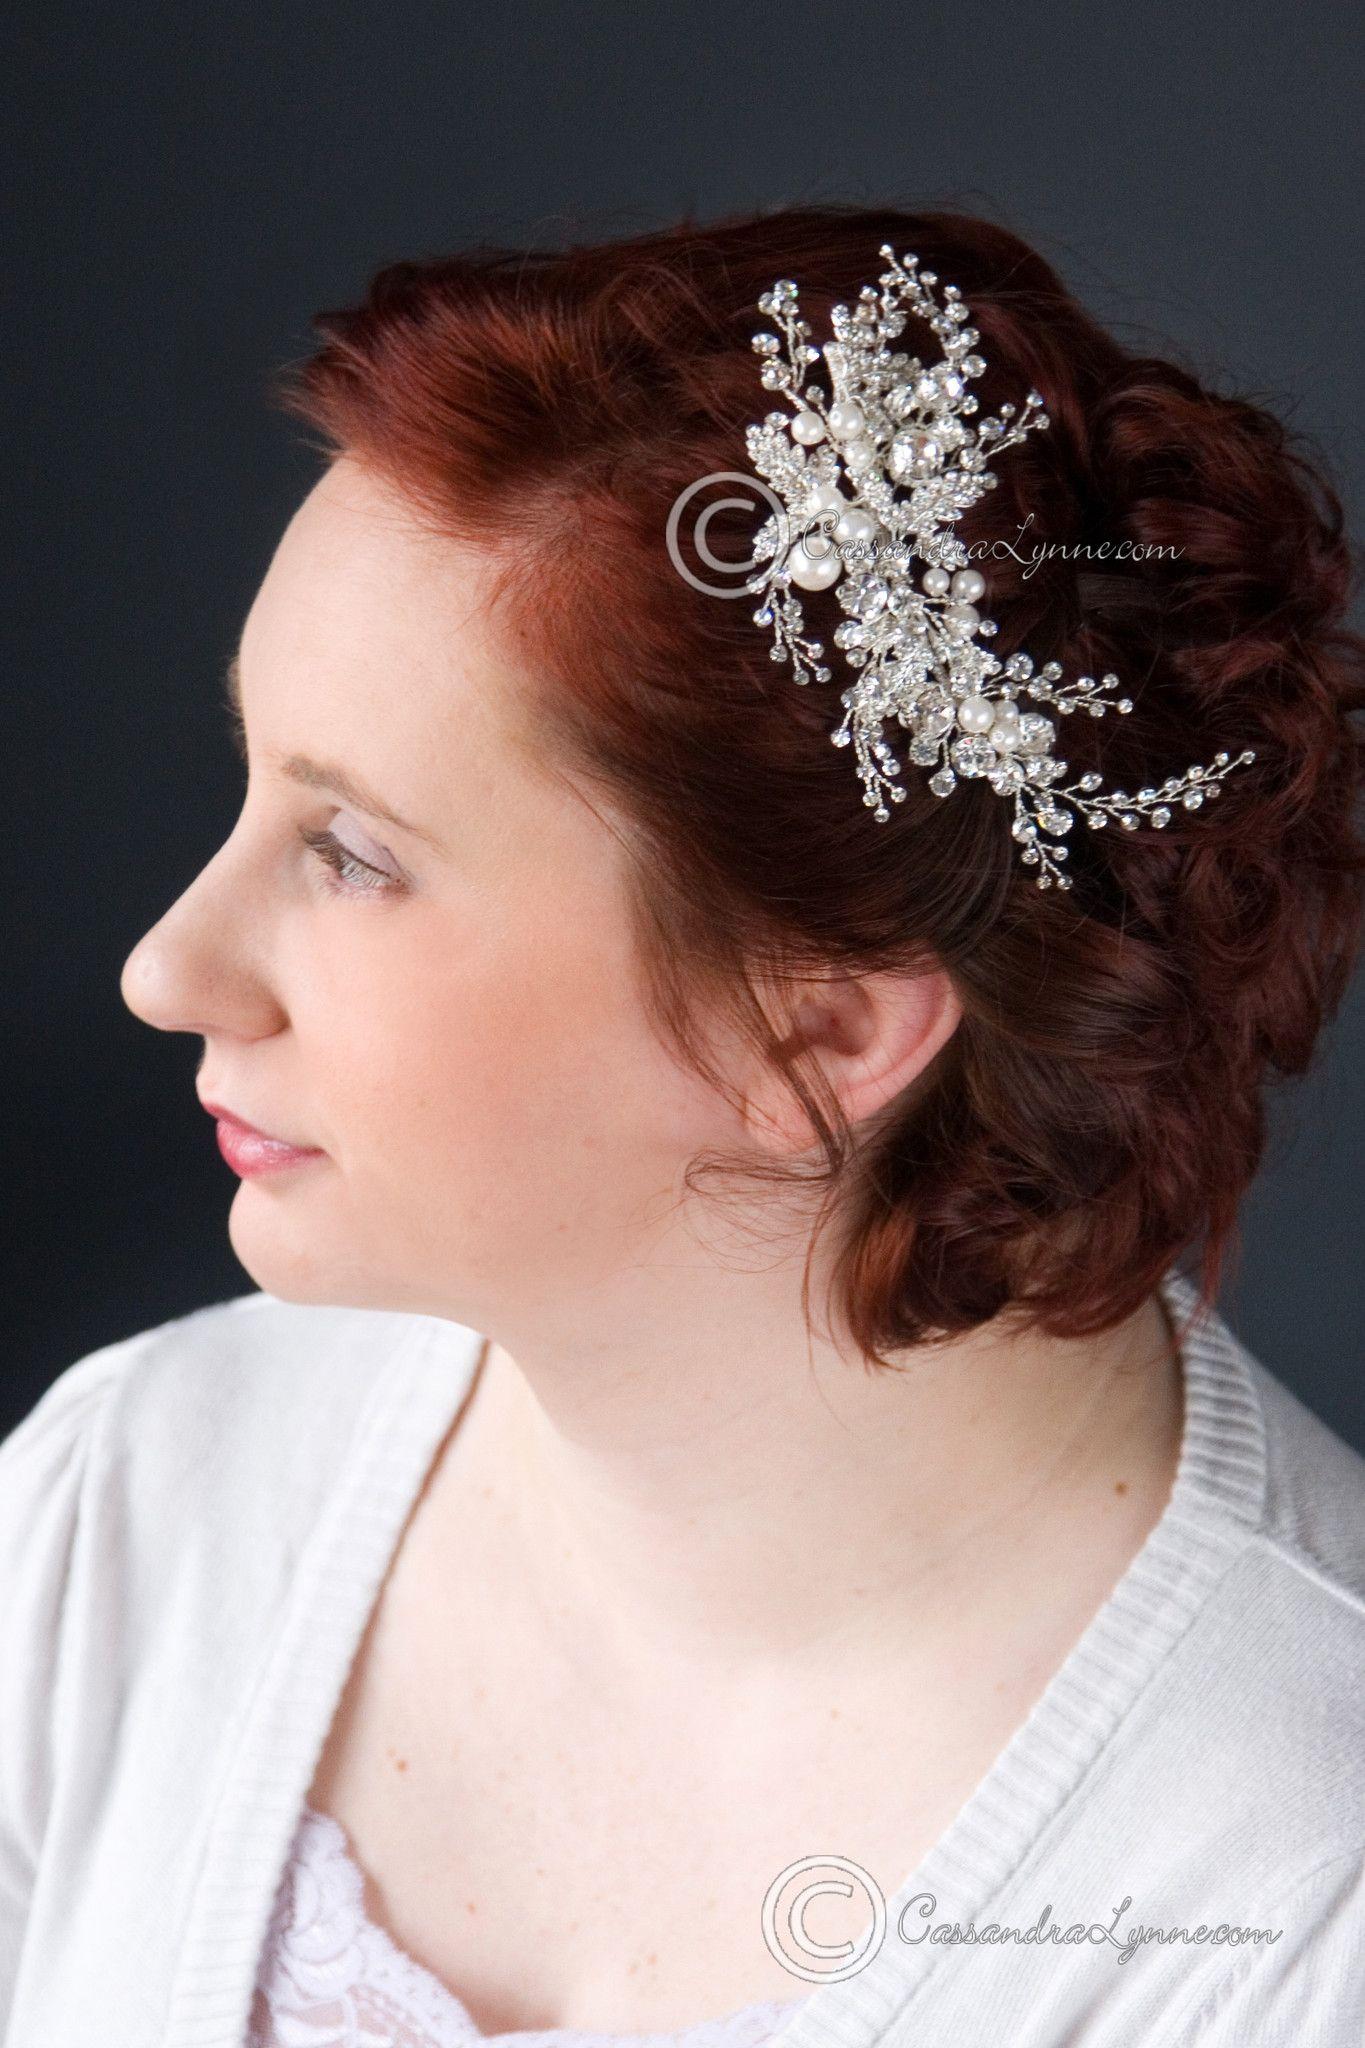 Bridal Headpiece Clip of Jewel Sprays and Pearls Headpieces